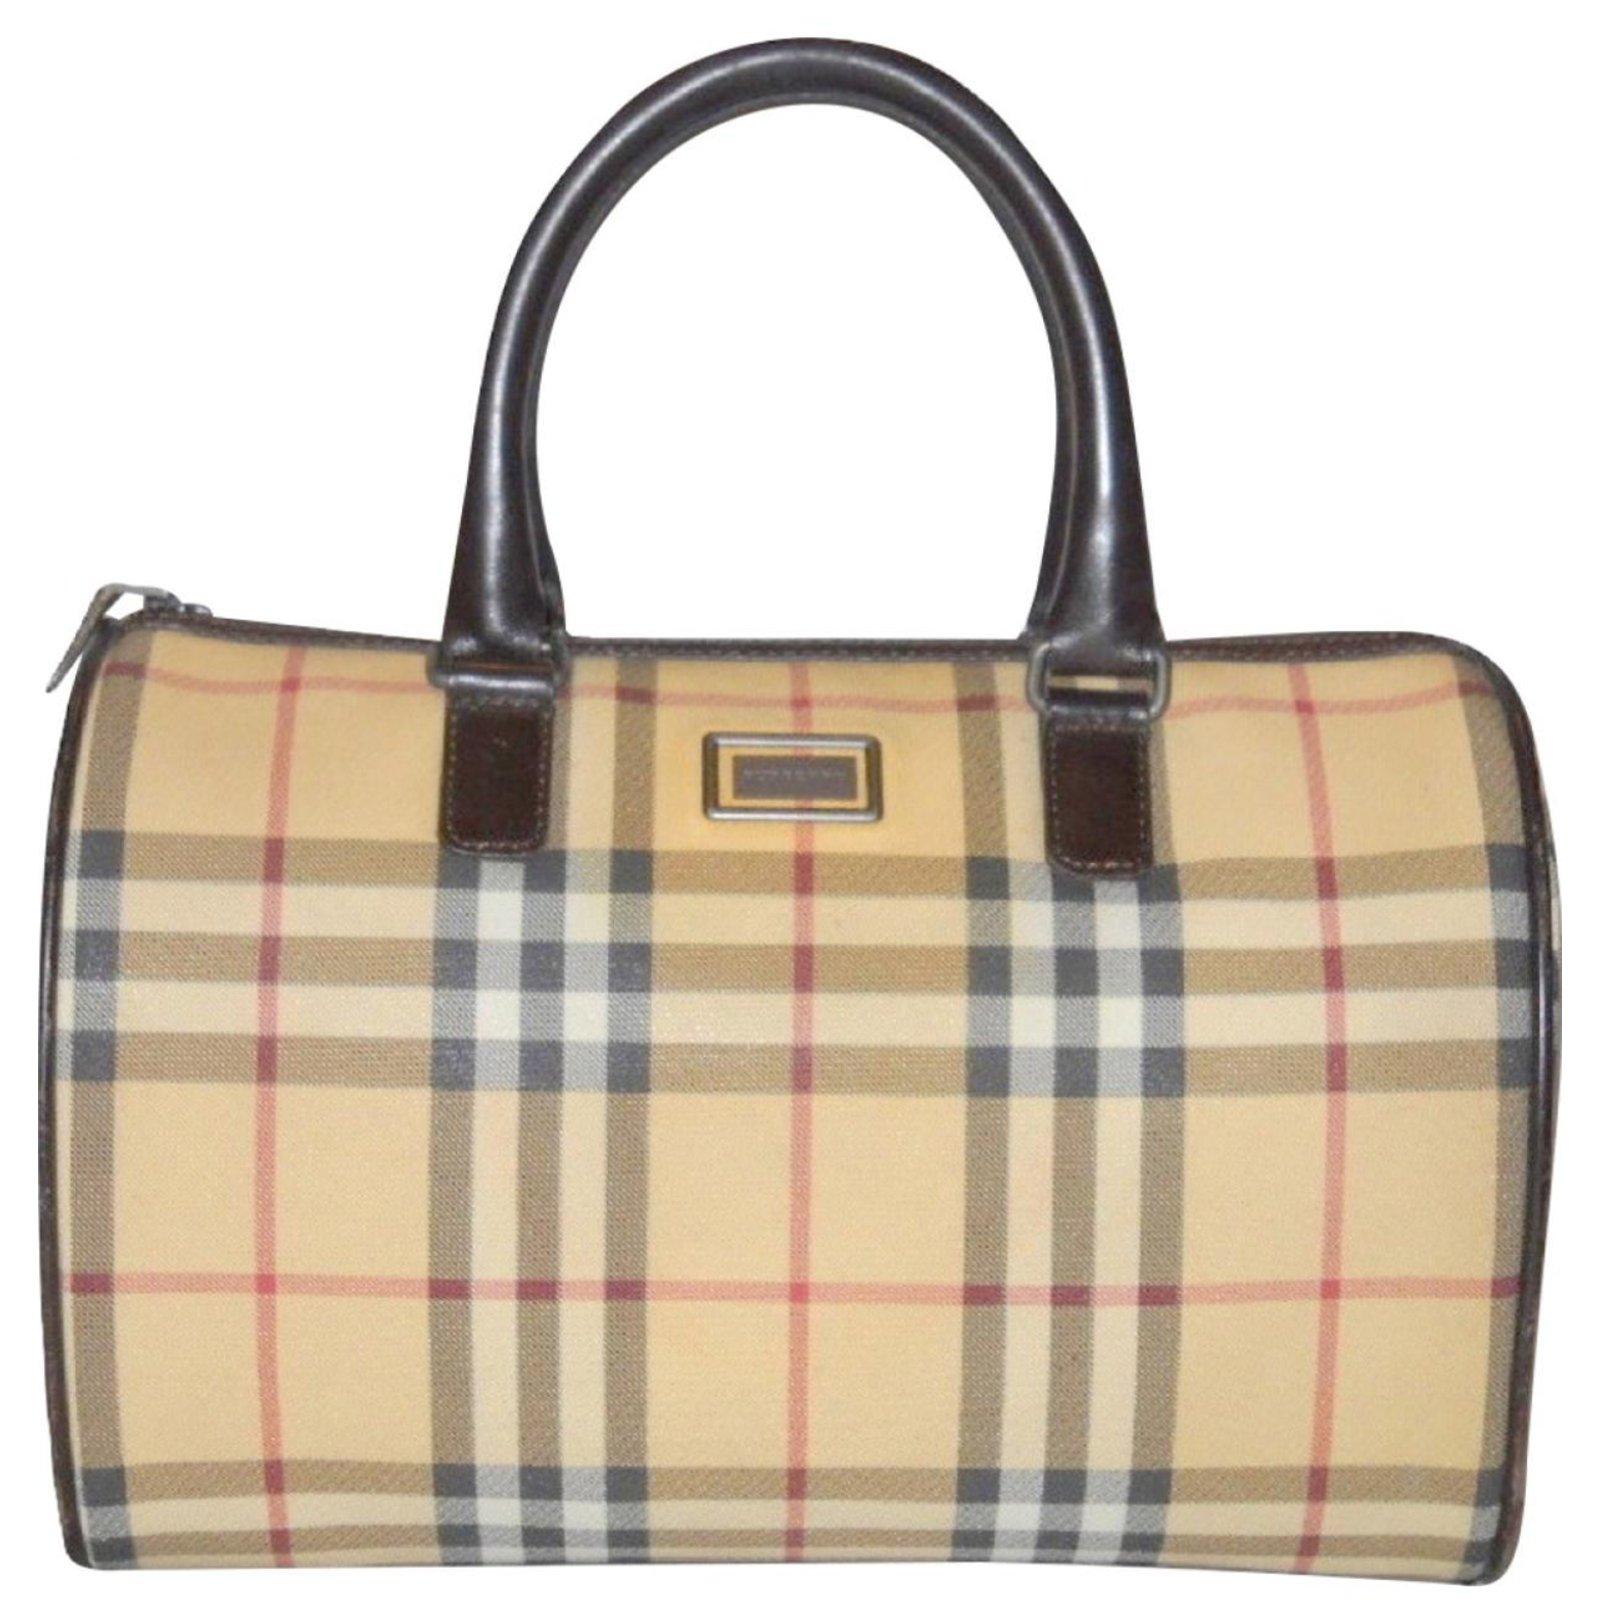 2c36ea043014 Burberry Handbags And Purses Purseblog. Burberry Handbags Leather Synthetic  Brown Beige Ref 77664